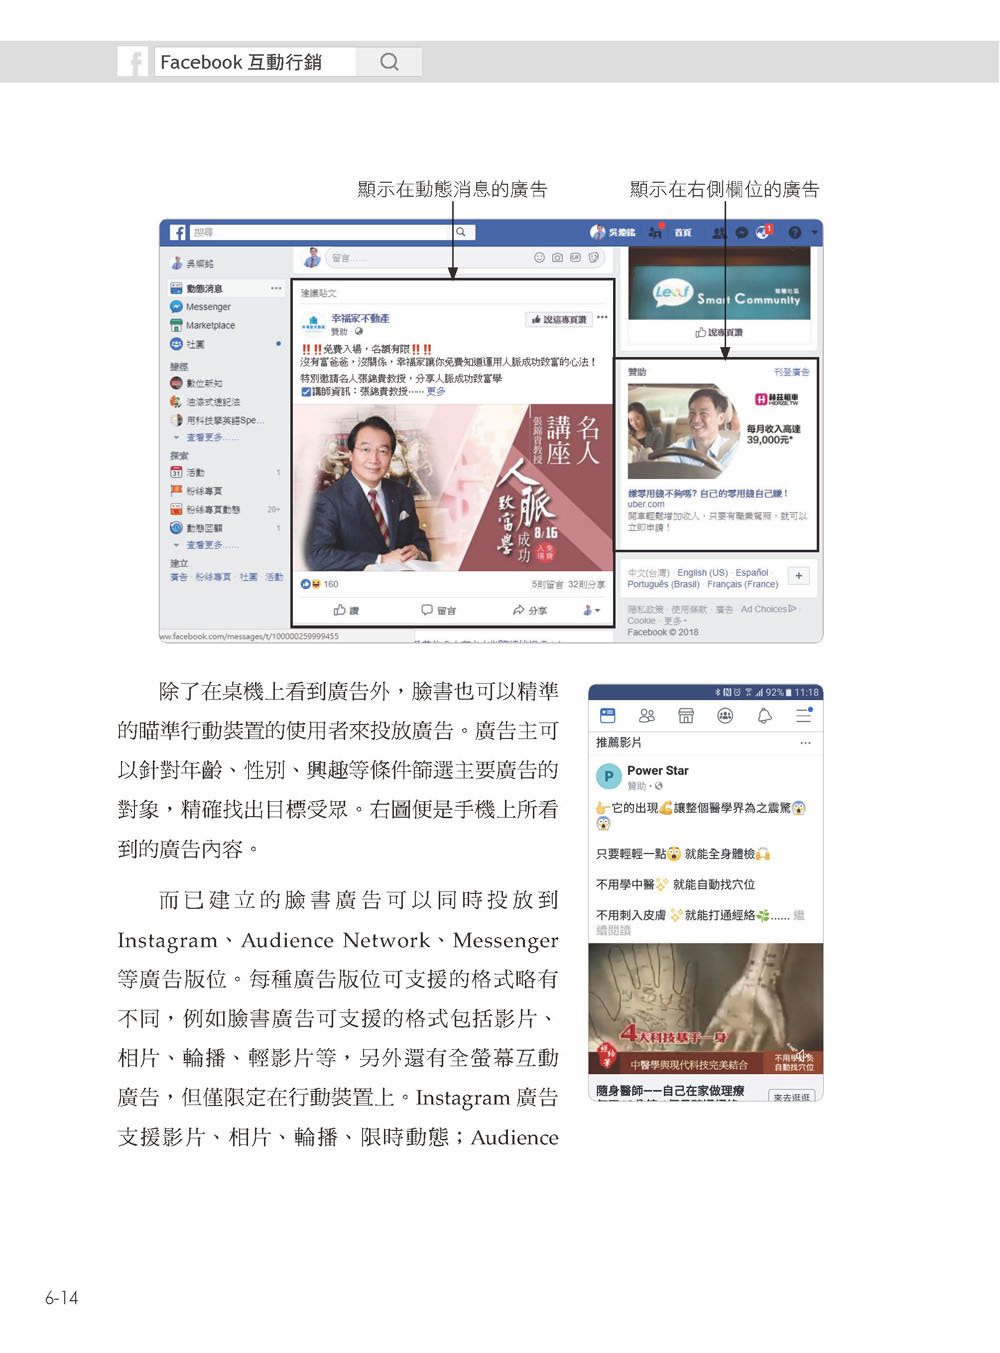 Facebook 互動行銷:社群口碑經營新思路+廣告投放如何有成效,想做好臉書行銷,操作心法就在這!-preview-13